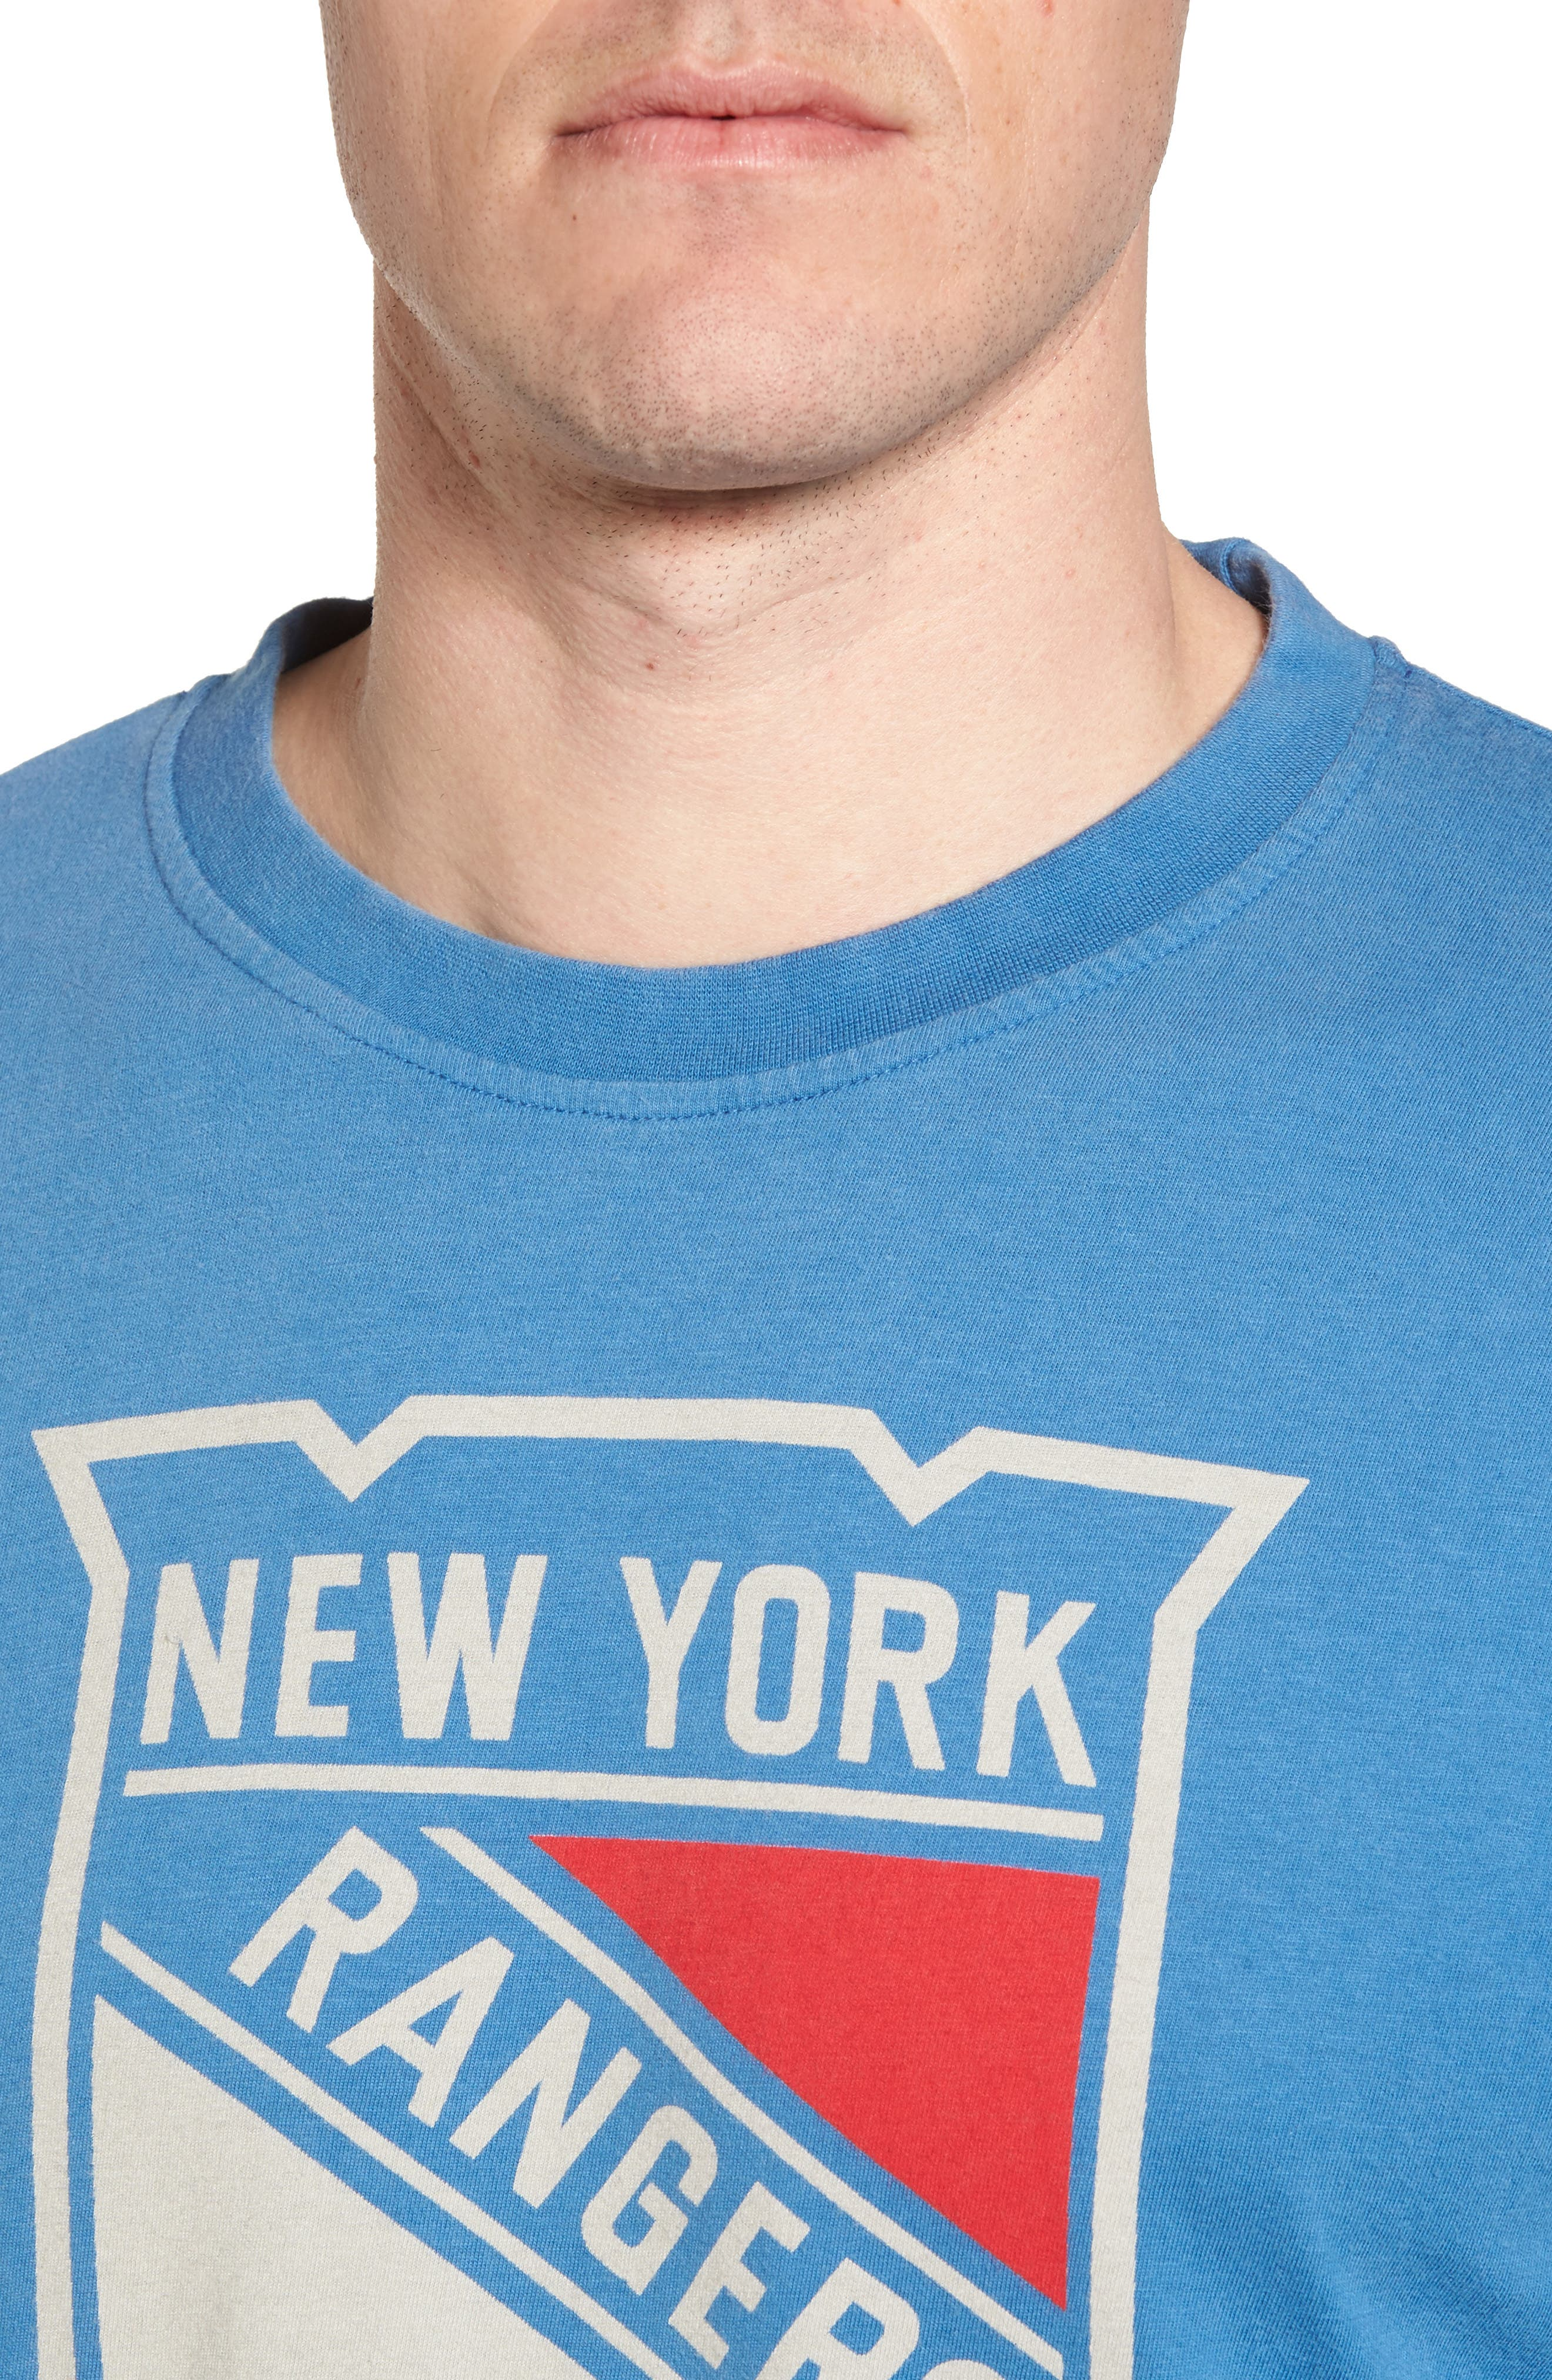 Gresham New York Rangers T-Shirt,                             Alternate thumbnail 4, color,                             Royal